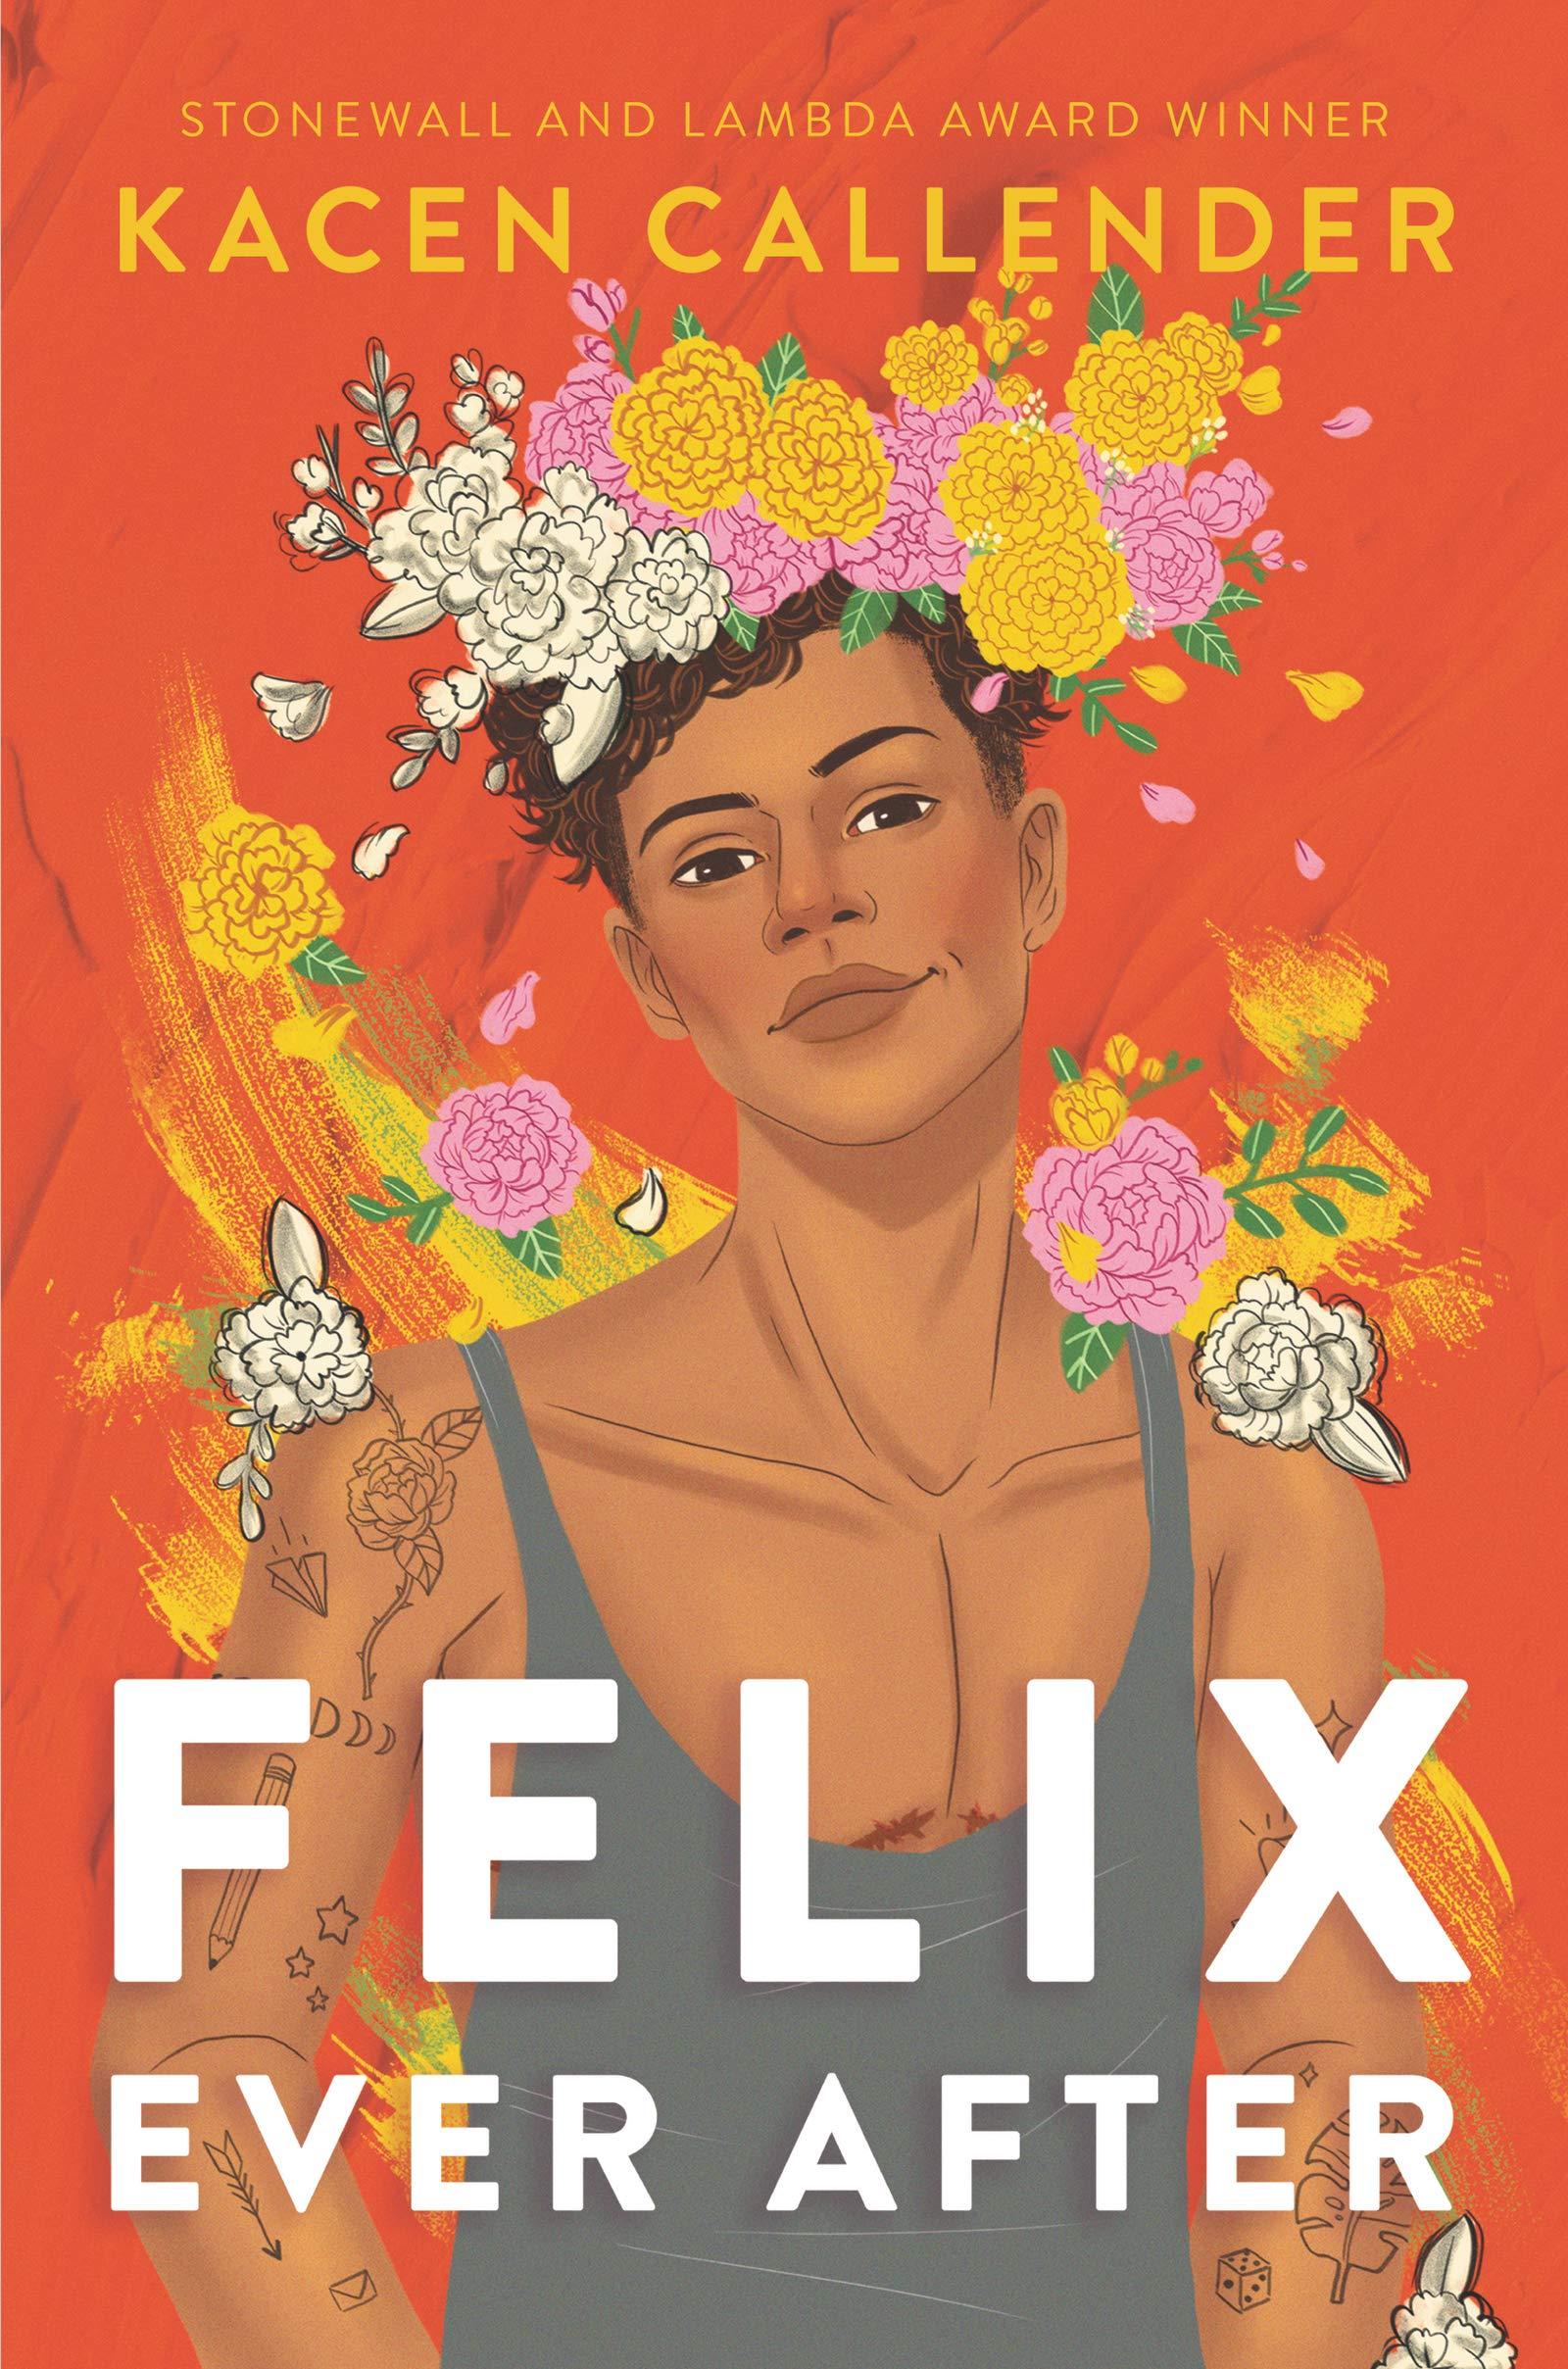 Amazon.com: Felix Ever After (9780062820259): Kacen Callender: Books